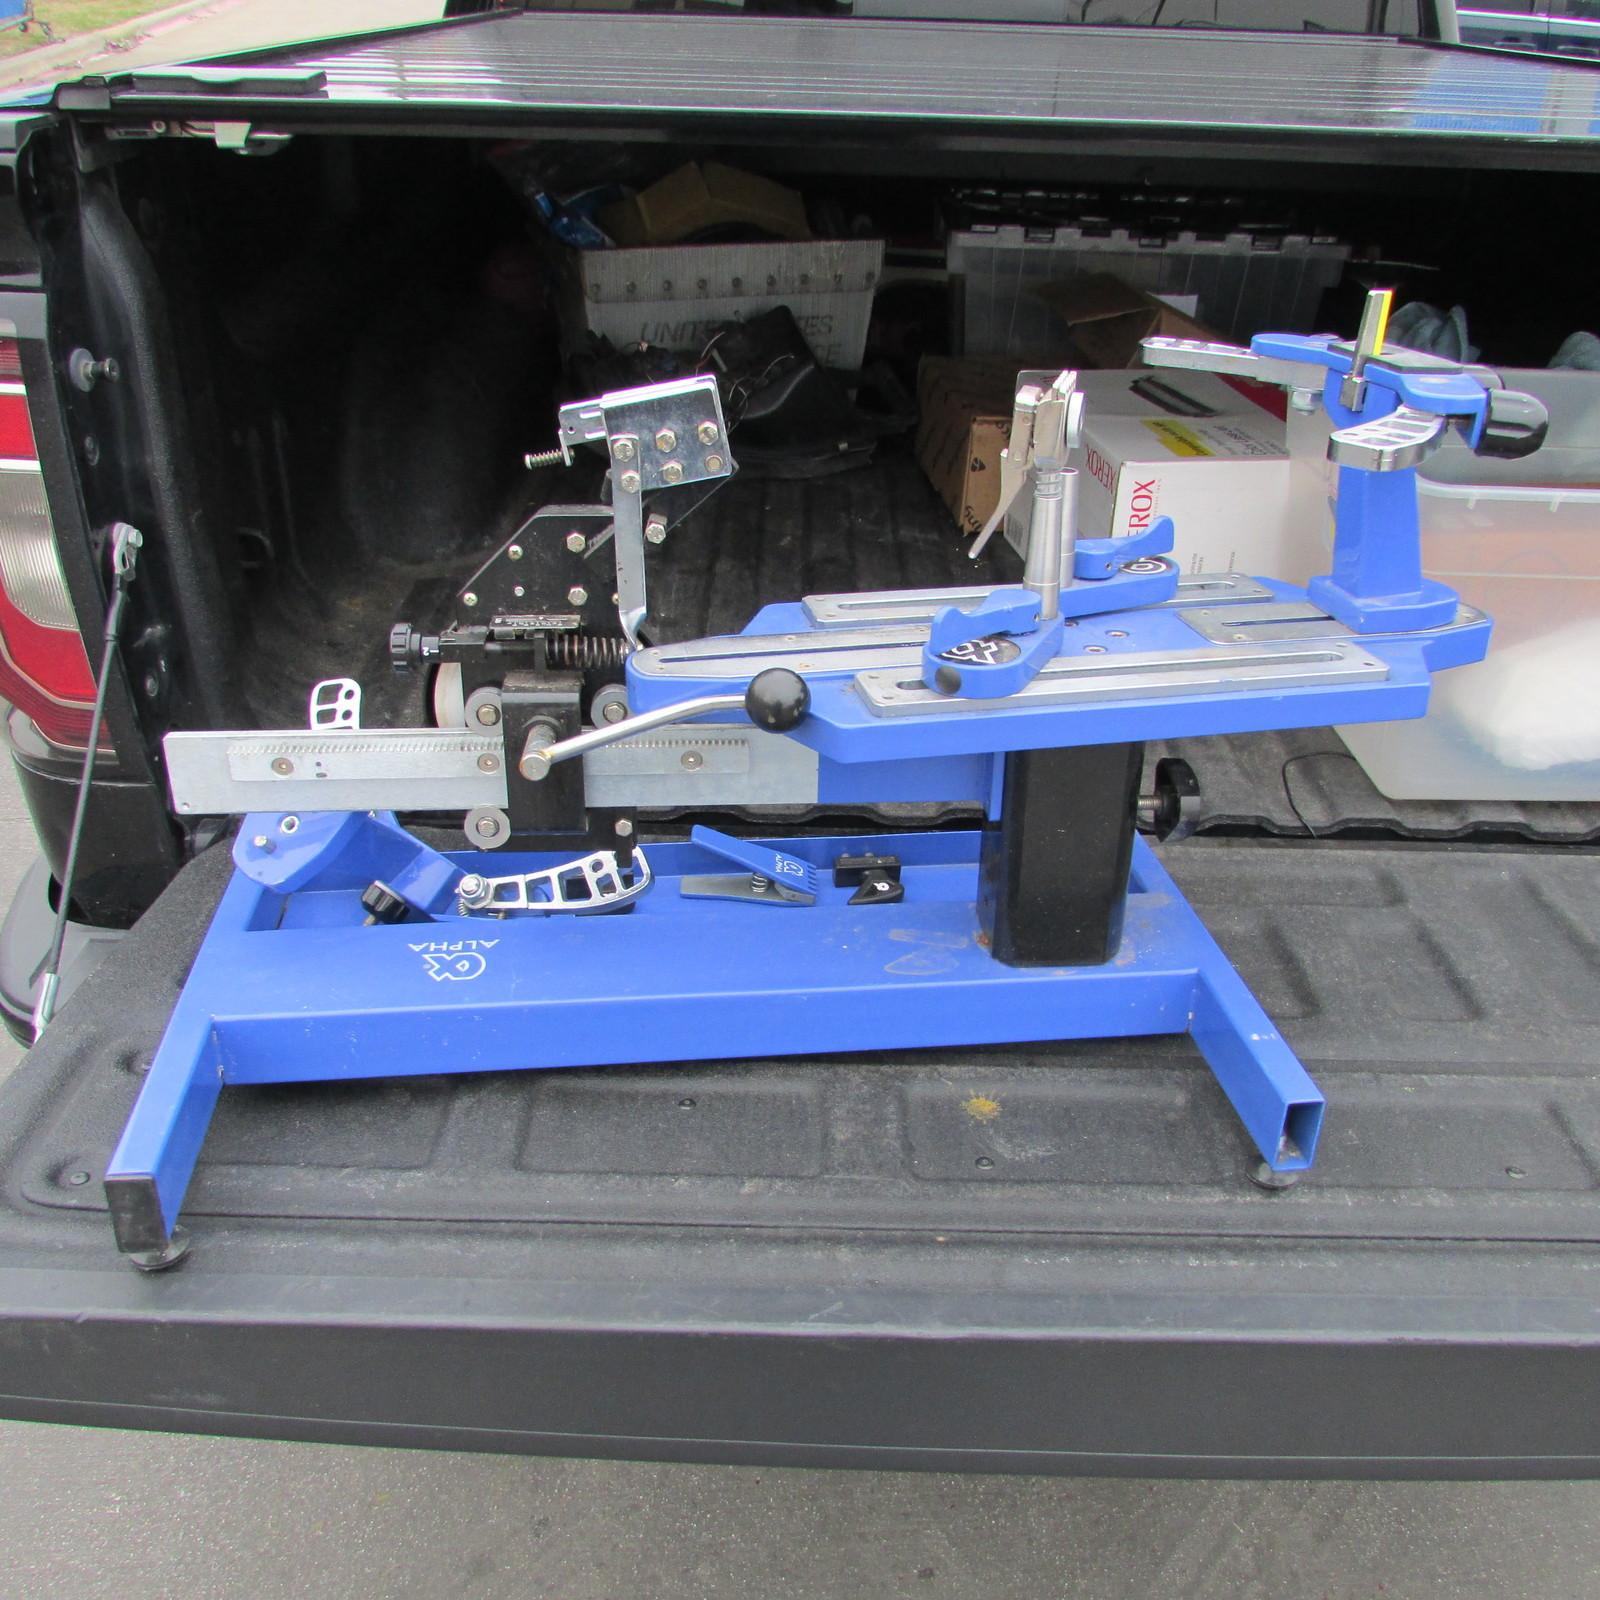 Alpha REVO 4000 Tennis Stringing Machine- and 50 similar items